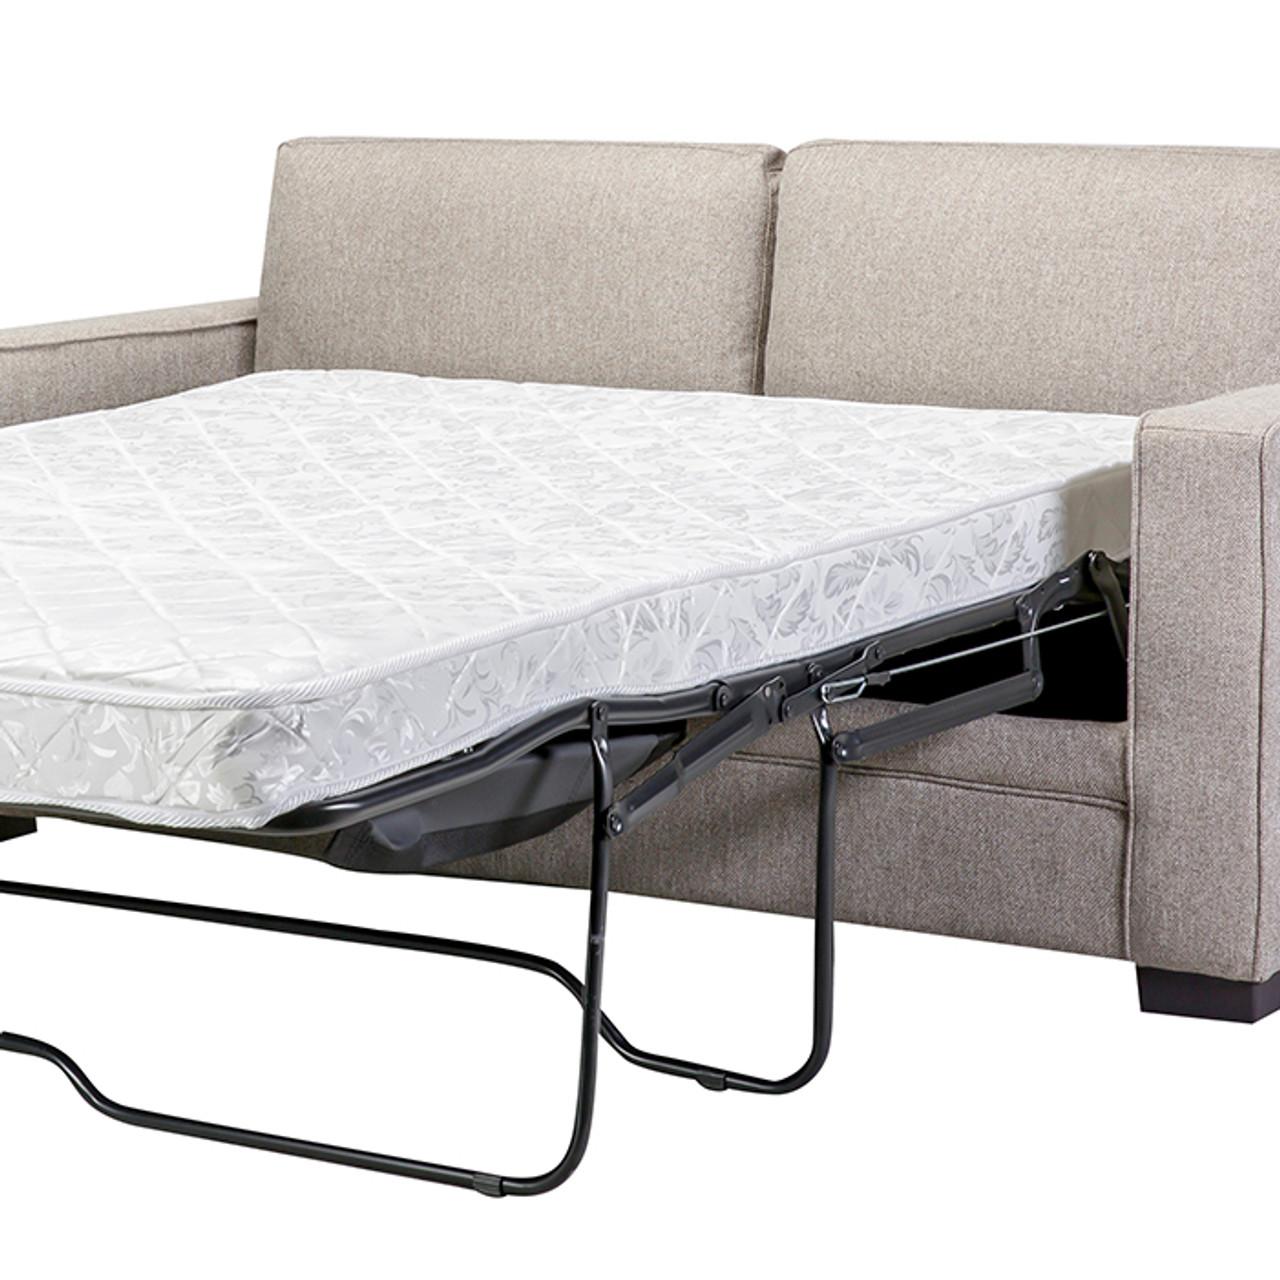 Remarkable Natural Latex Sofa Bed Machost Co Dining Chair Design Ideas Machostcouk